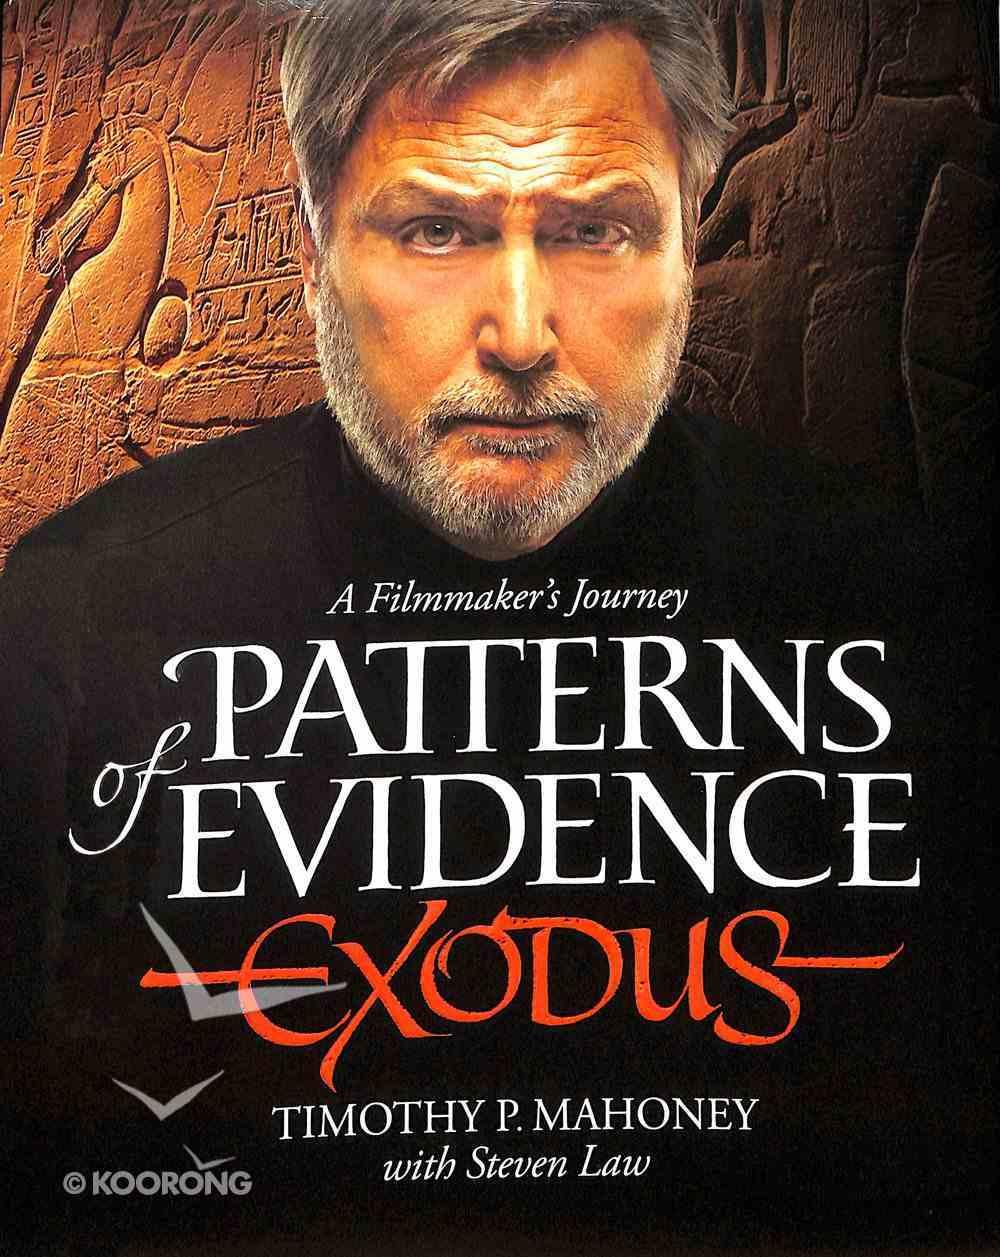 Patterns of Evidence: Exodus - a Filmmaker's Journey Hardback